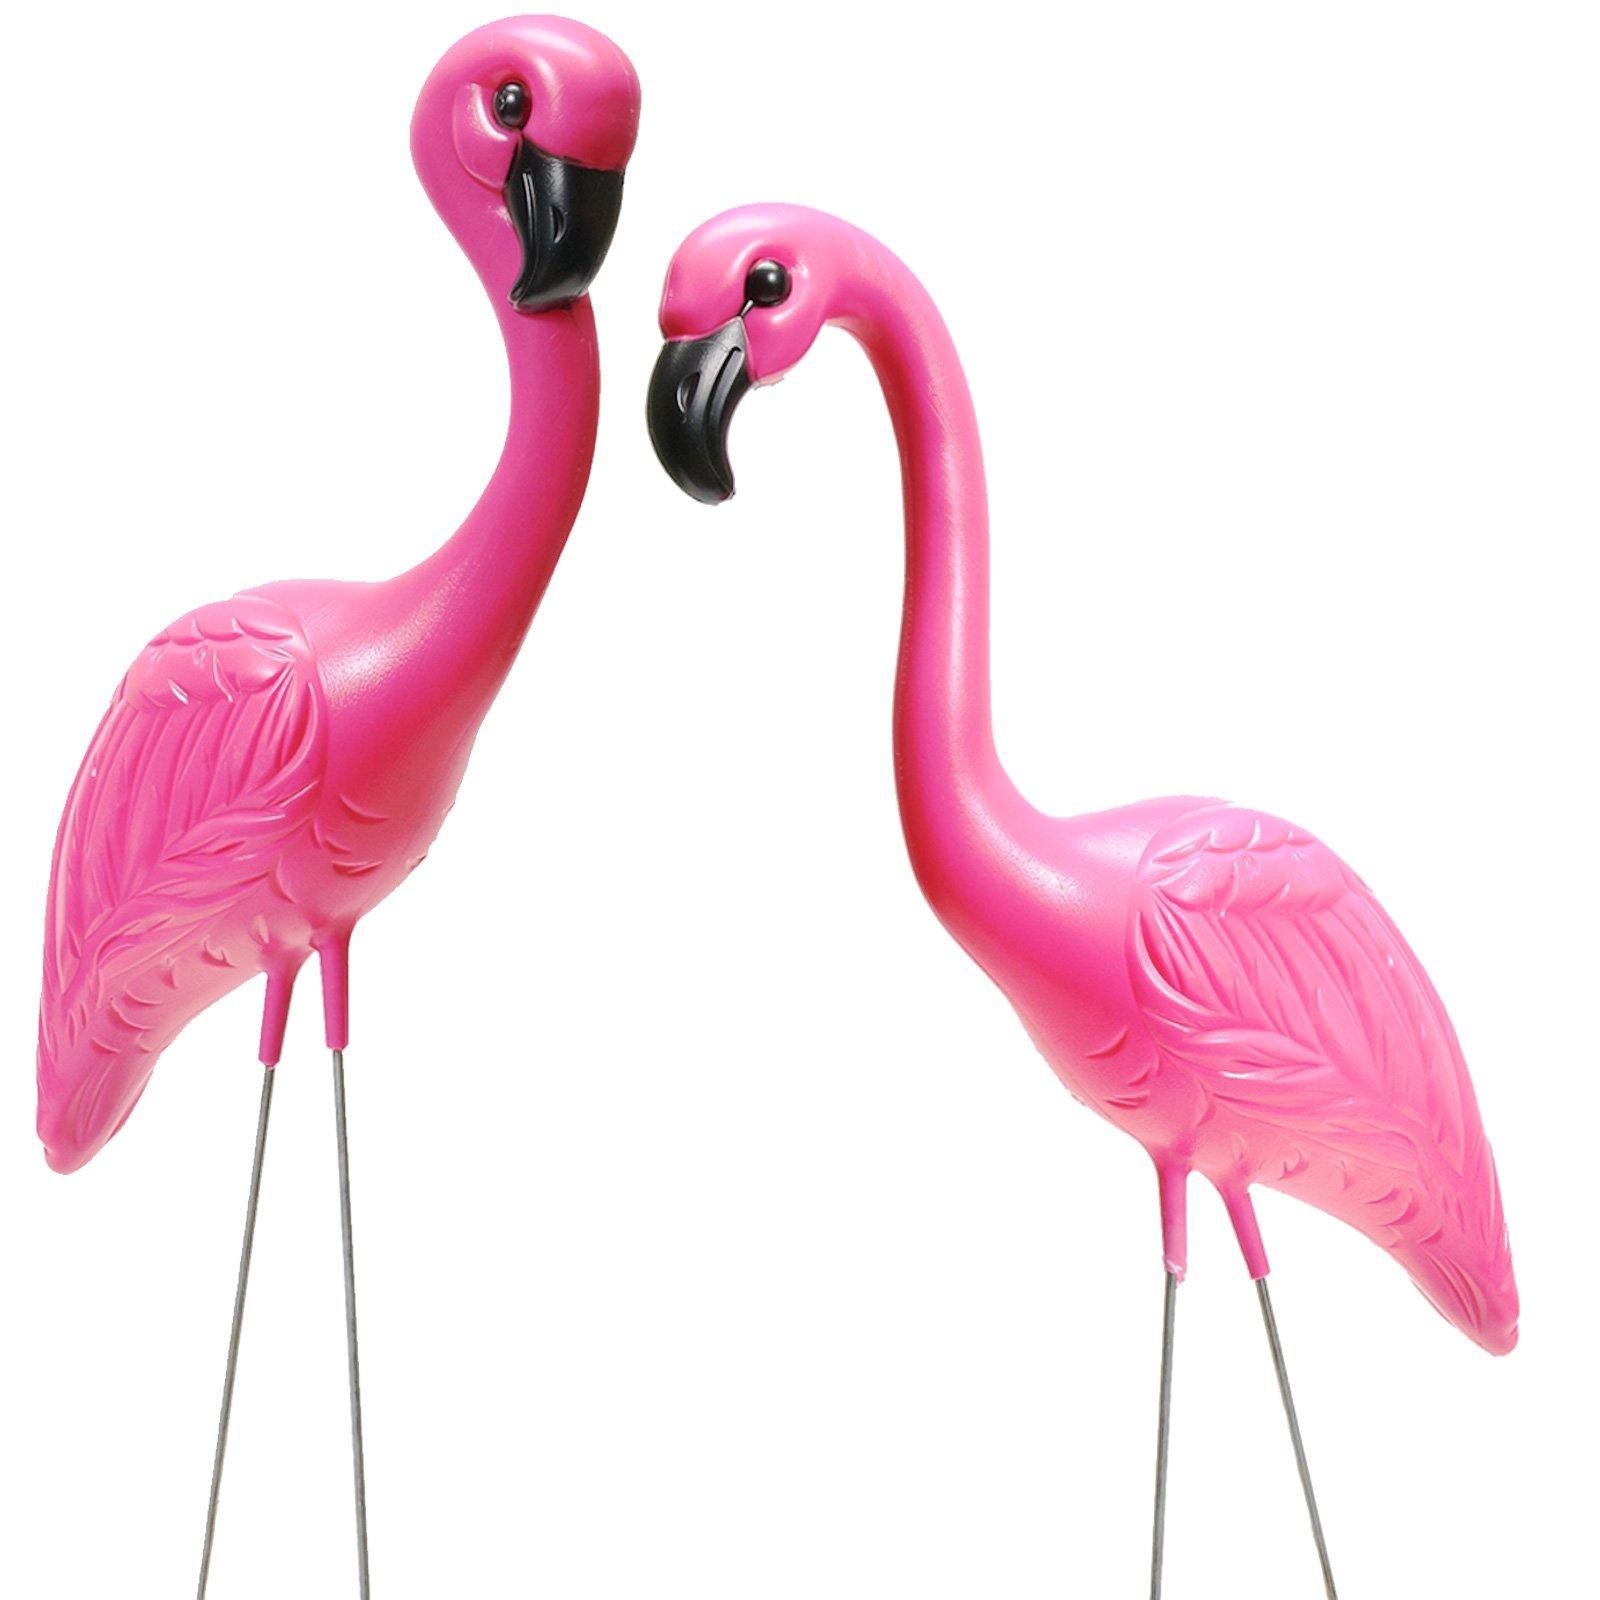 Fun Express - Pink Flamingo Novelty Yard Lawn Art Garden Ornaments (1-Pack of 2) by Fun Express (Image #1)